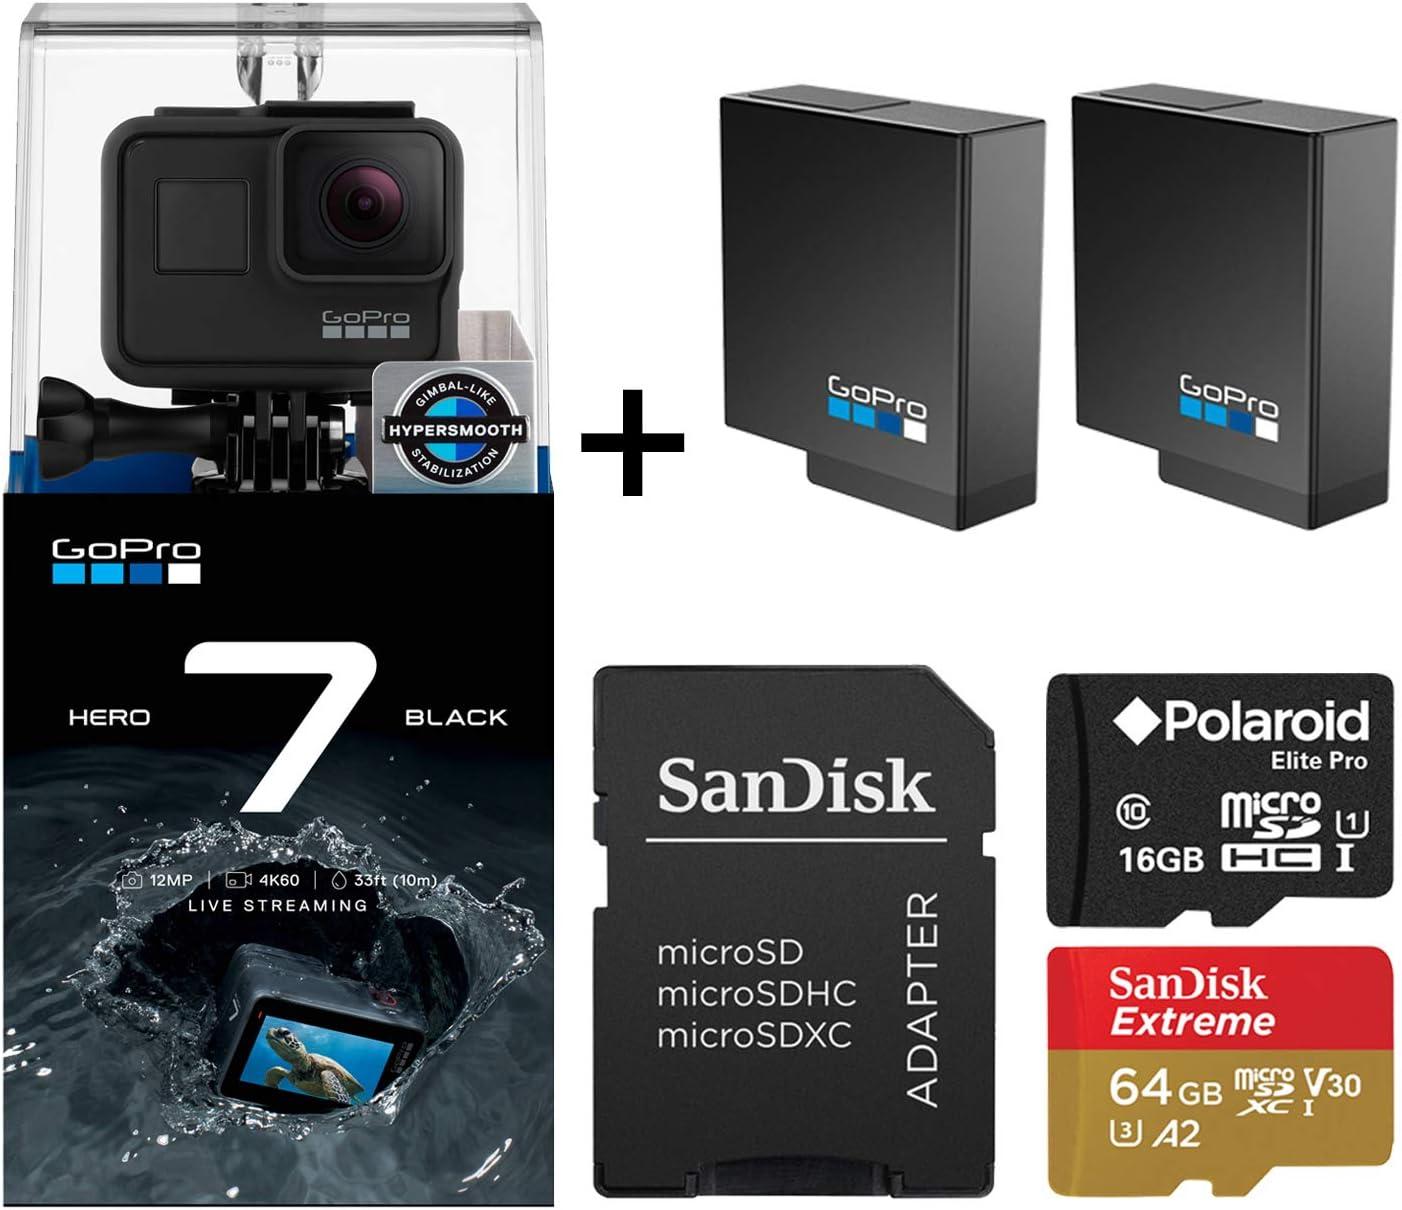 GoPro Hero 7 Black Edition with Two Extra GoPro USA Batteries + Sandisk Extreme 64GB MicroSD + Free Polaroid 16GB MicroSD (80GB Total)